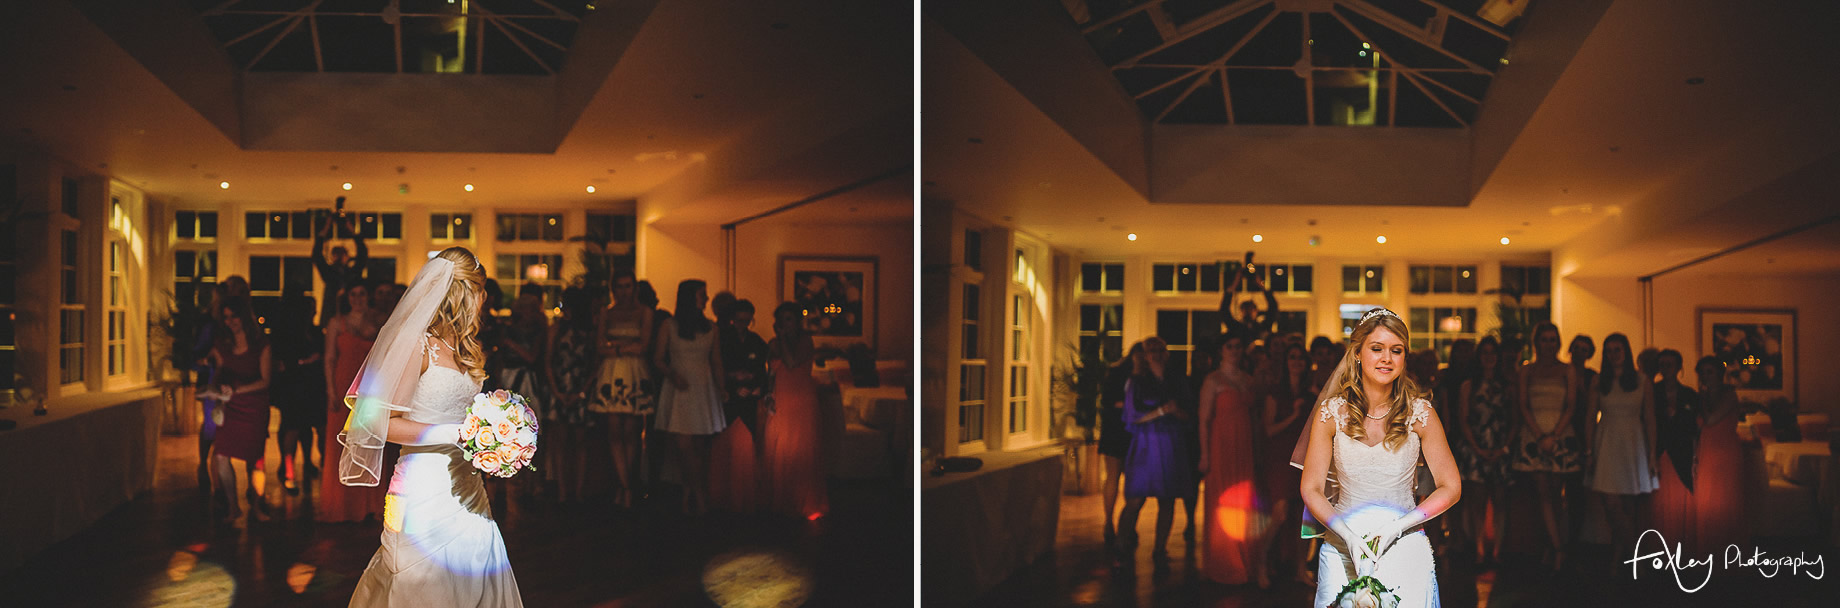 Gemma and Lewis' Wedding at Mitton Hall 145